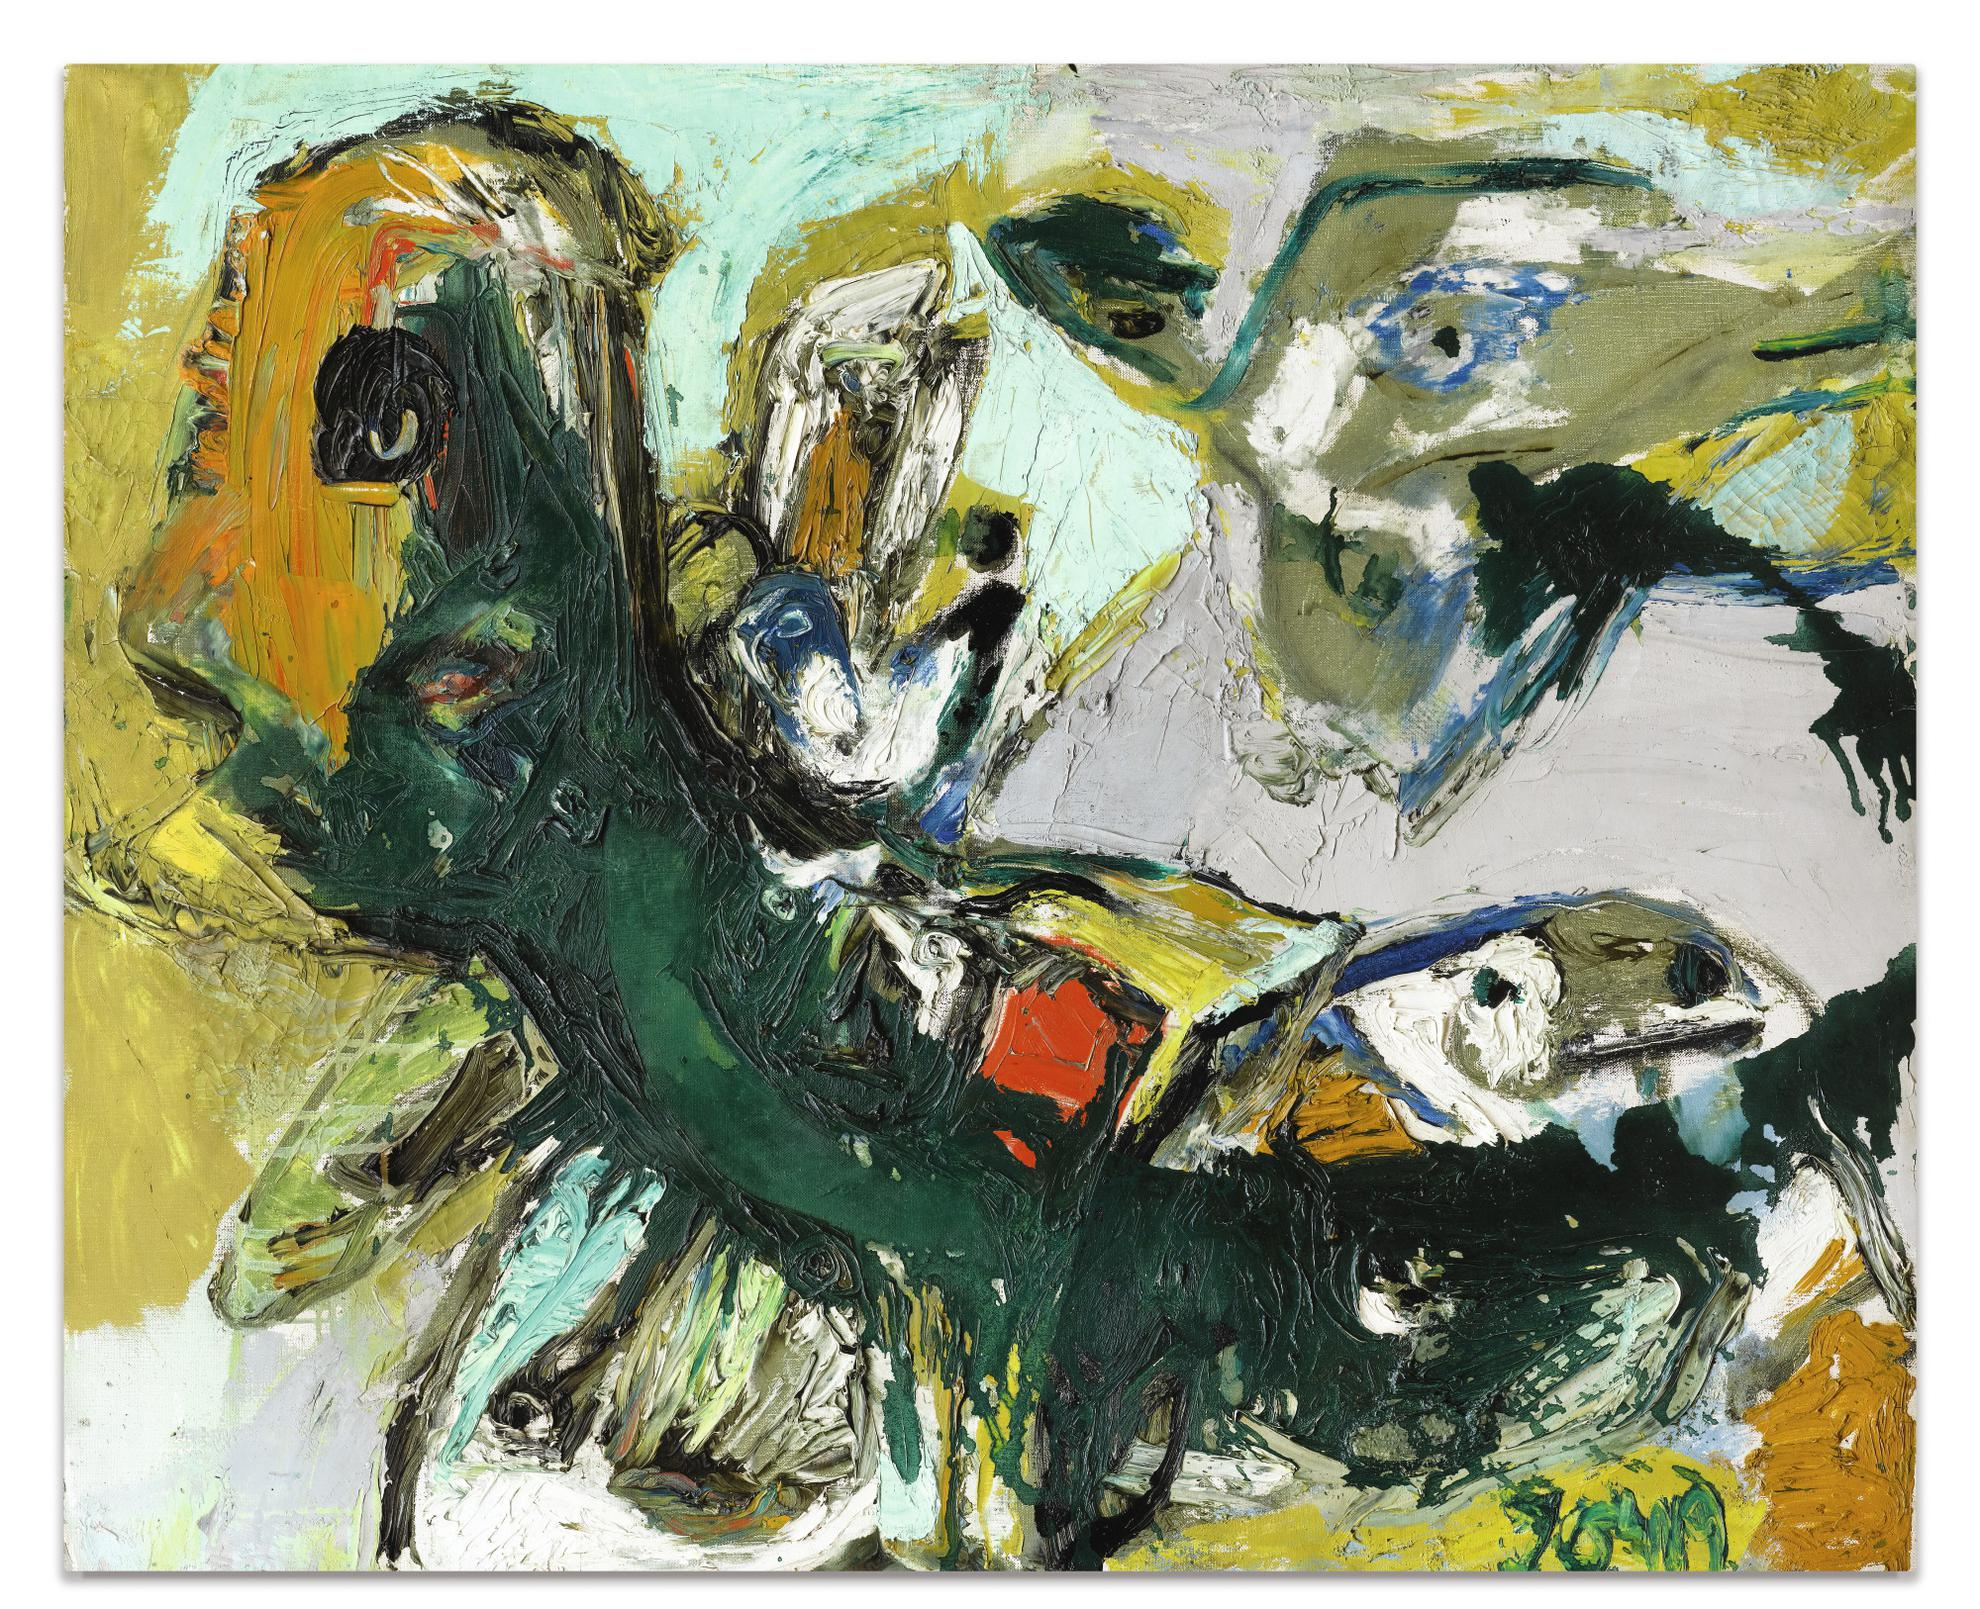 Asger Jorn-Loiseau Tetu 1-1957